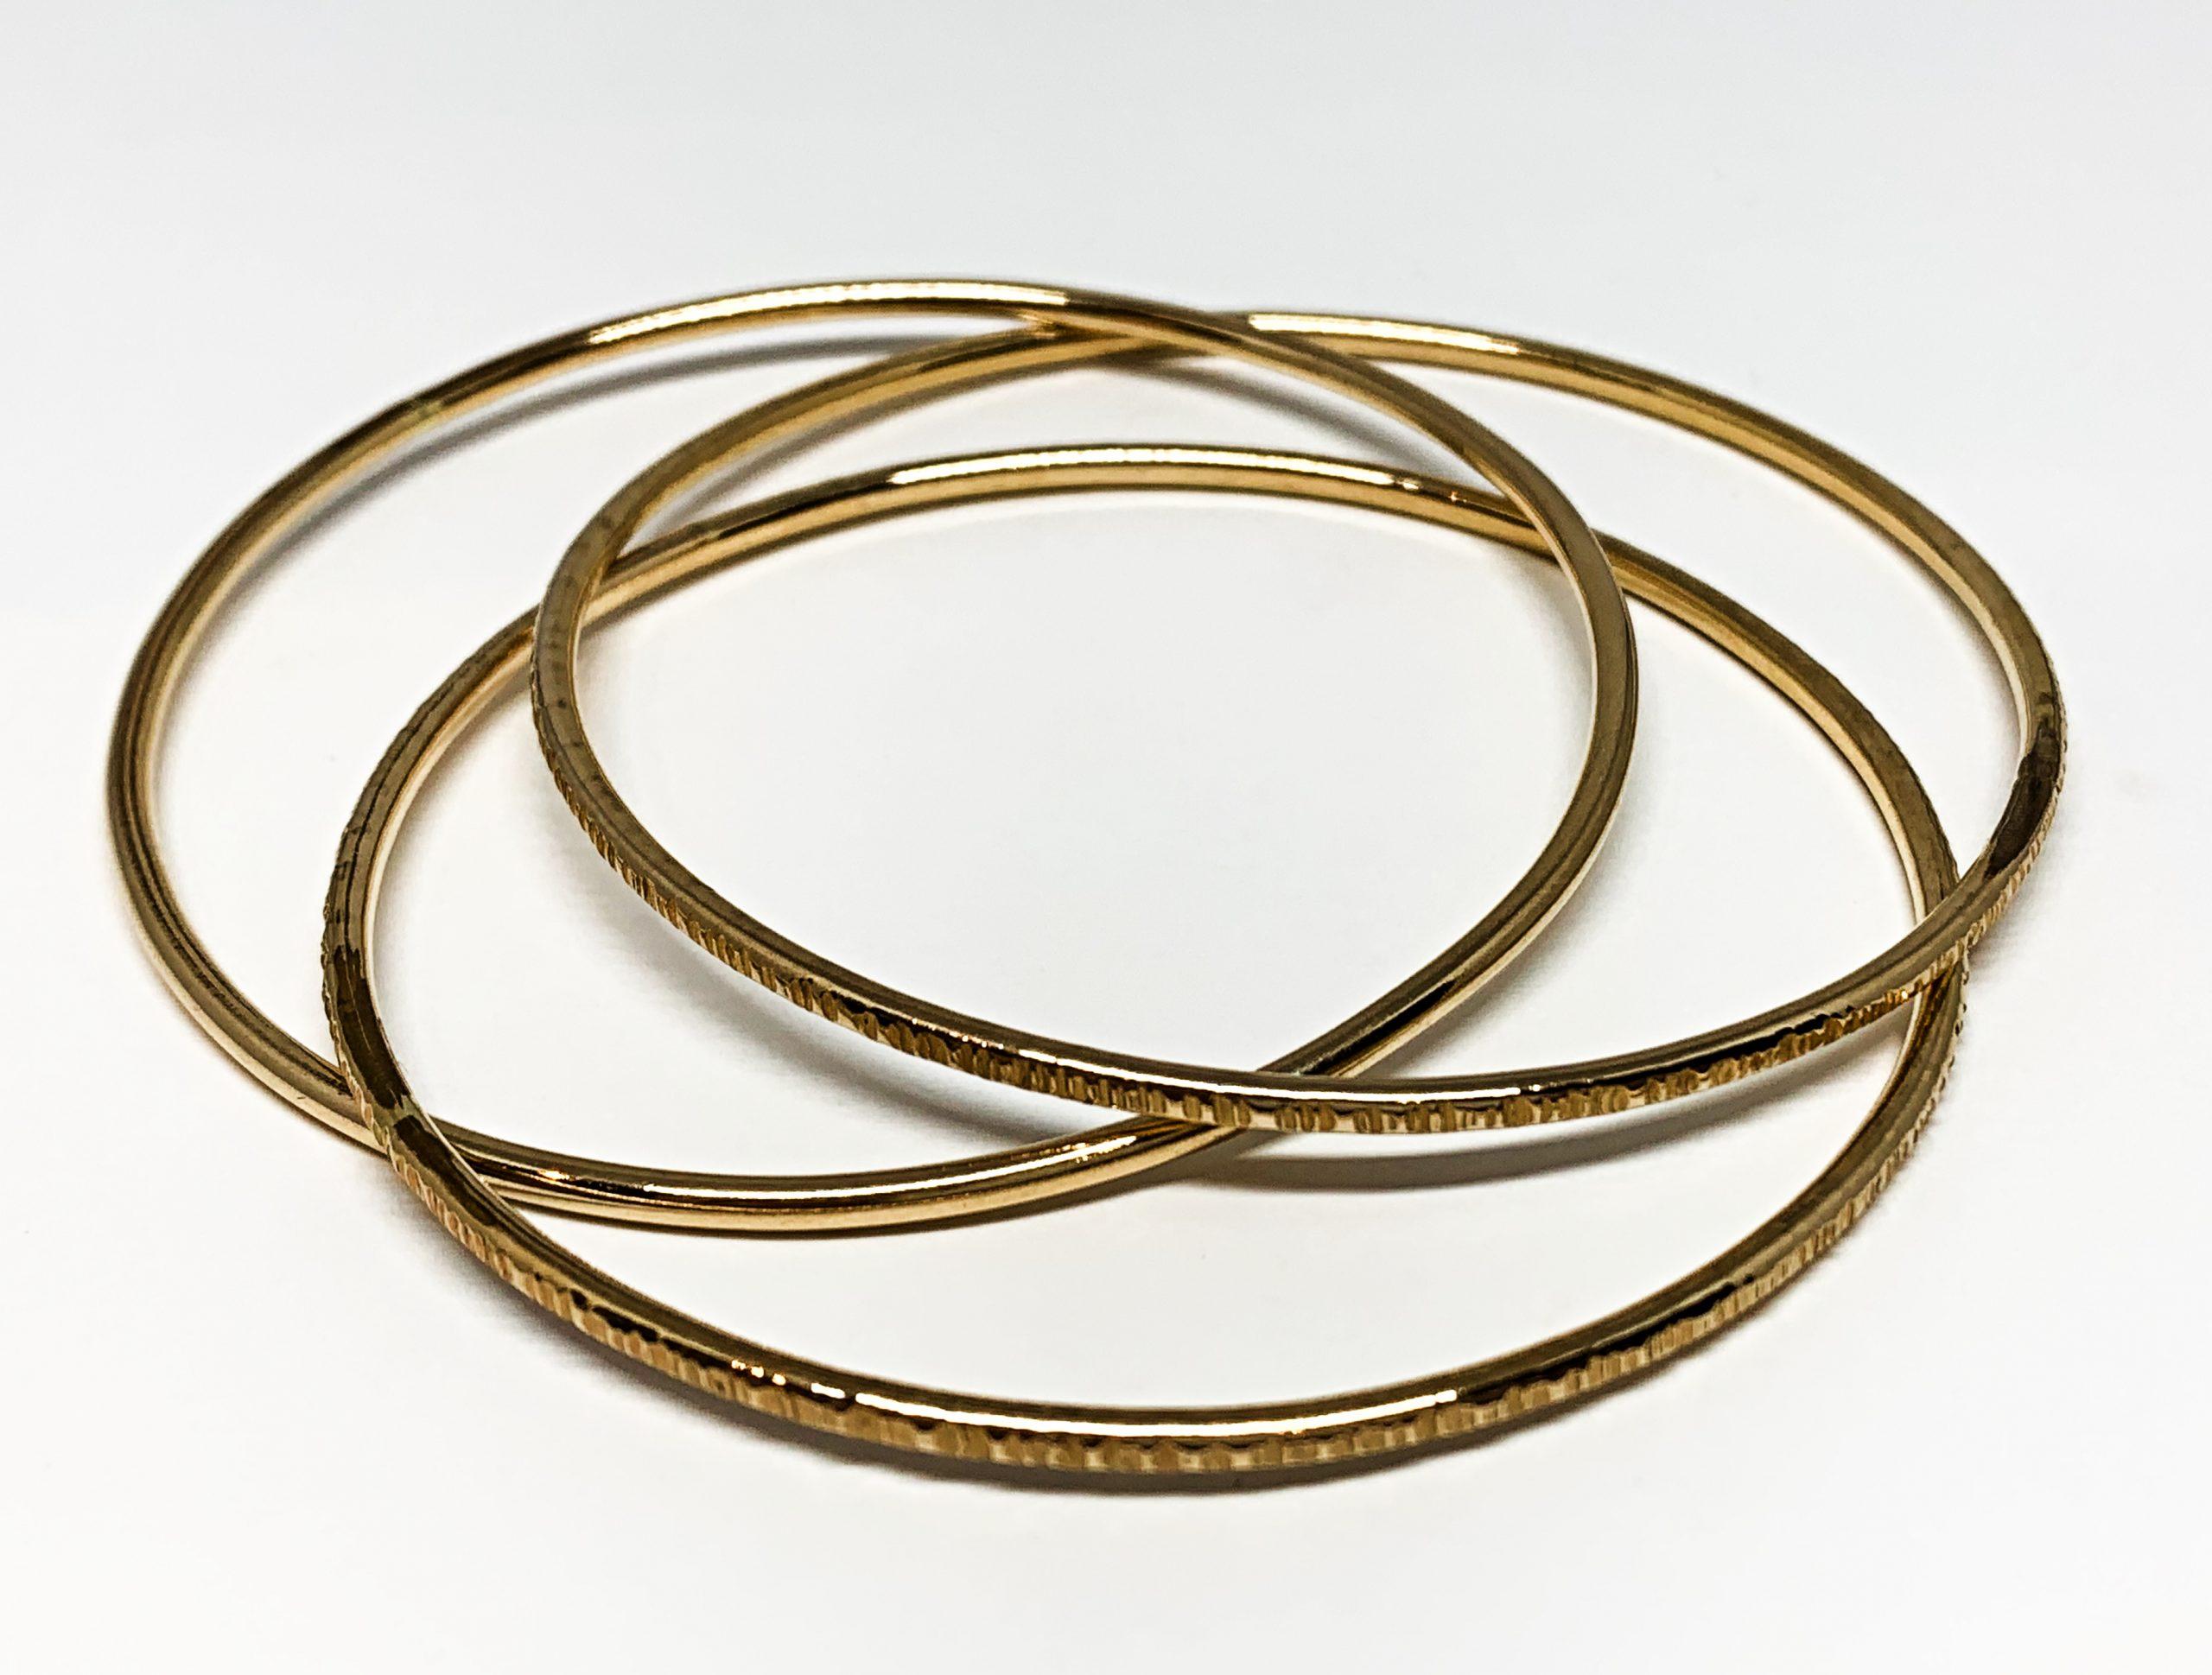 14 karat gold-fill interlocking bangles by Karyn Chopik | Effusion Art Gallery + Cast Glass Studio, Invermere BC